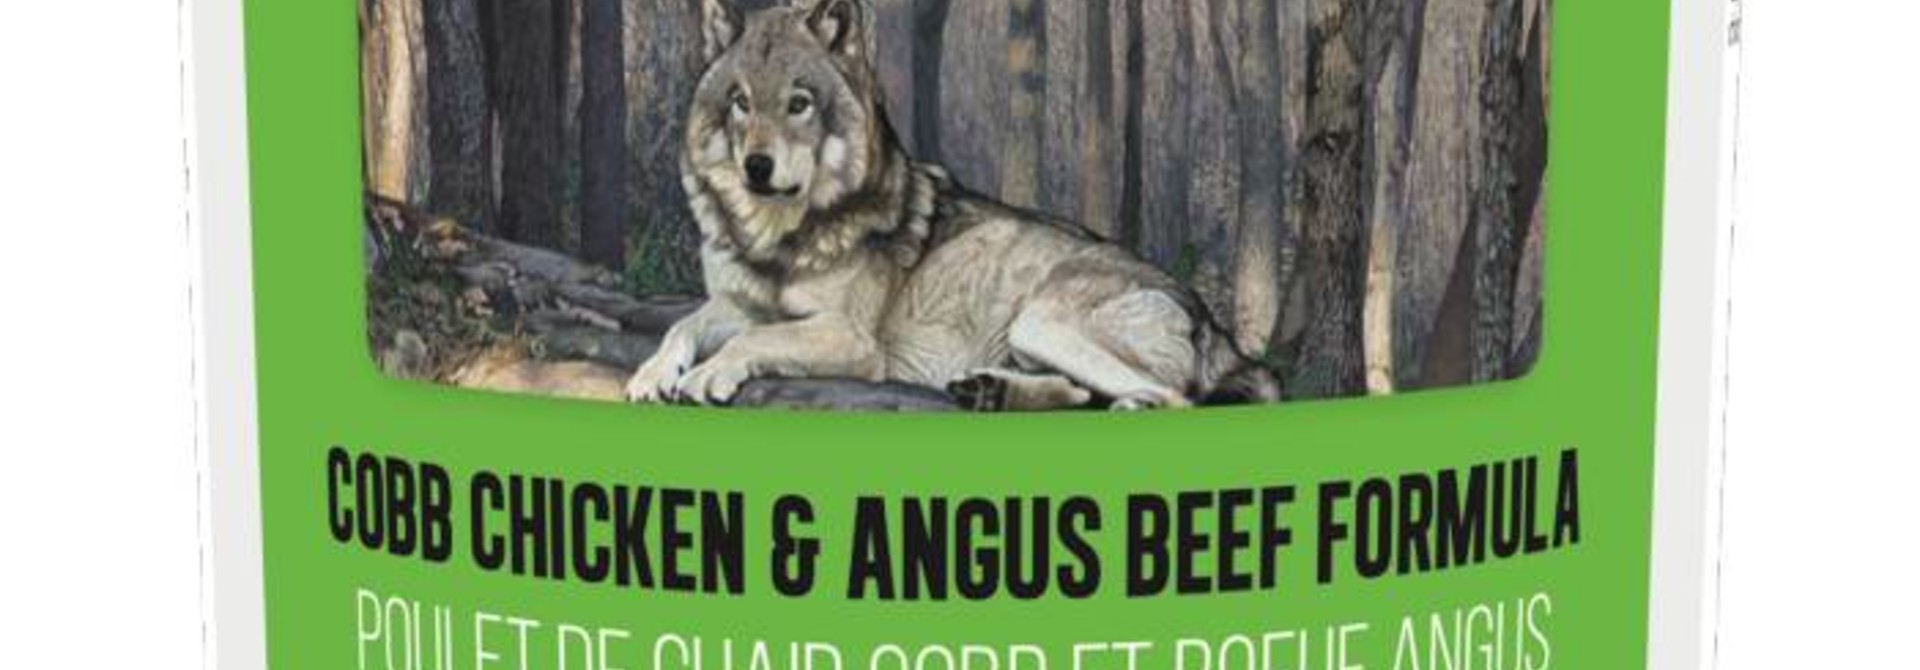 Boreal Dog Cobb Chicken & Angus Beef Formula 13oz